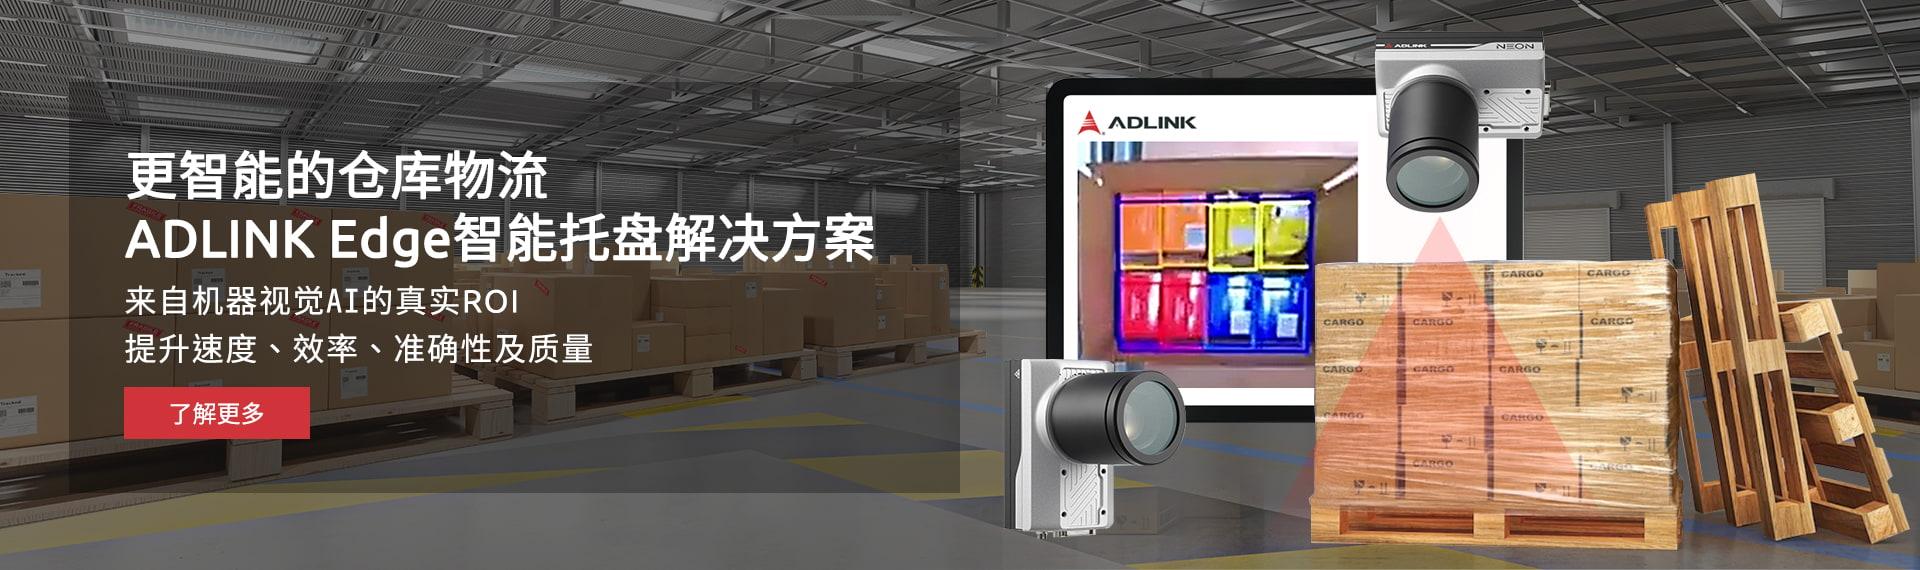 ADLINK Edge Smart Pallet